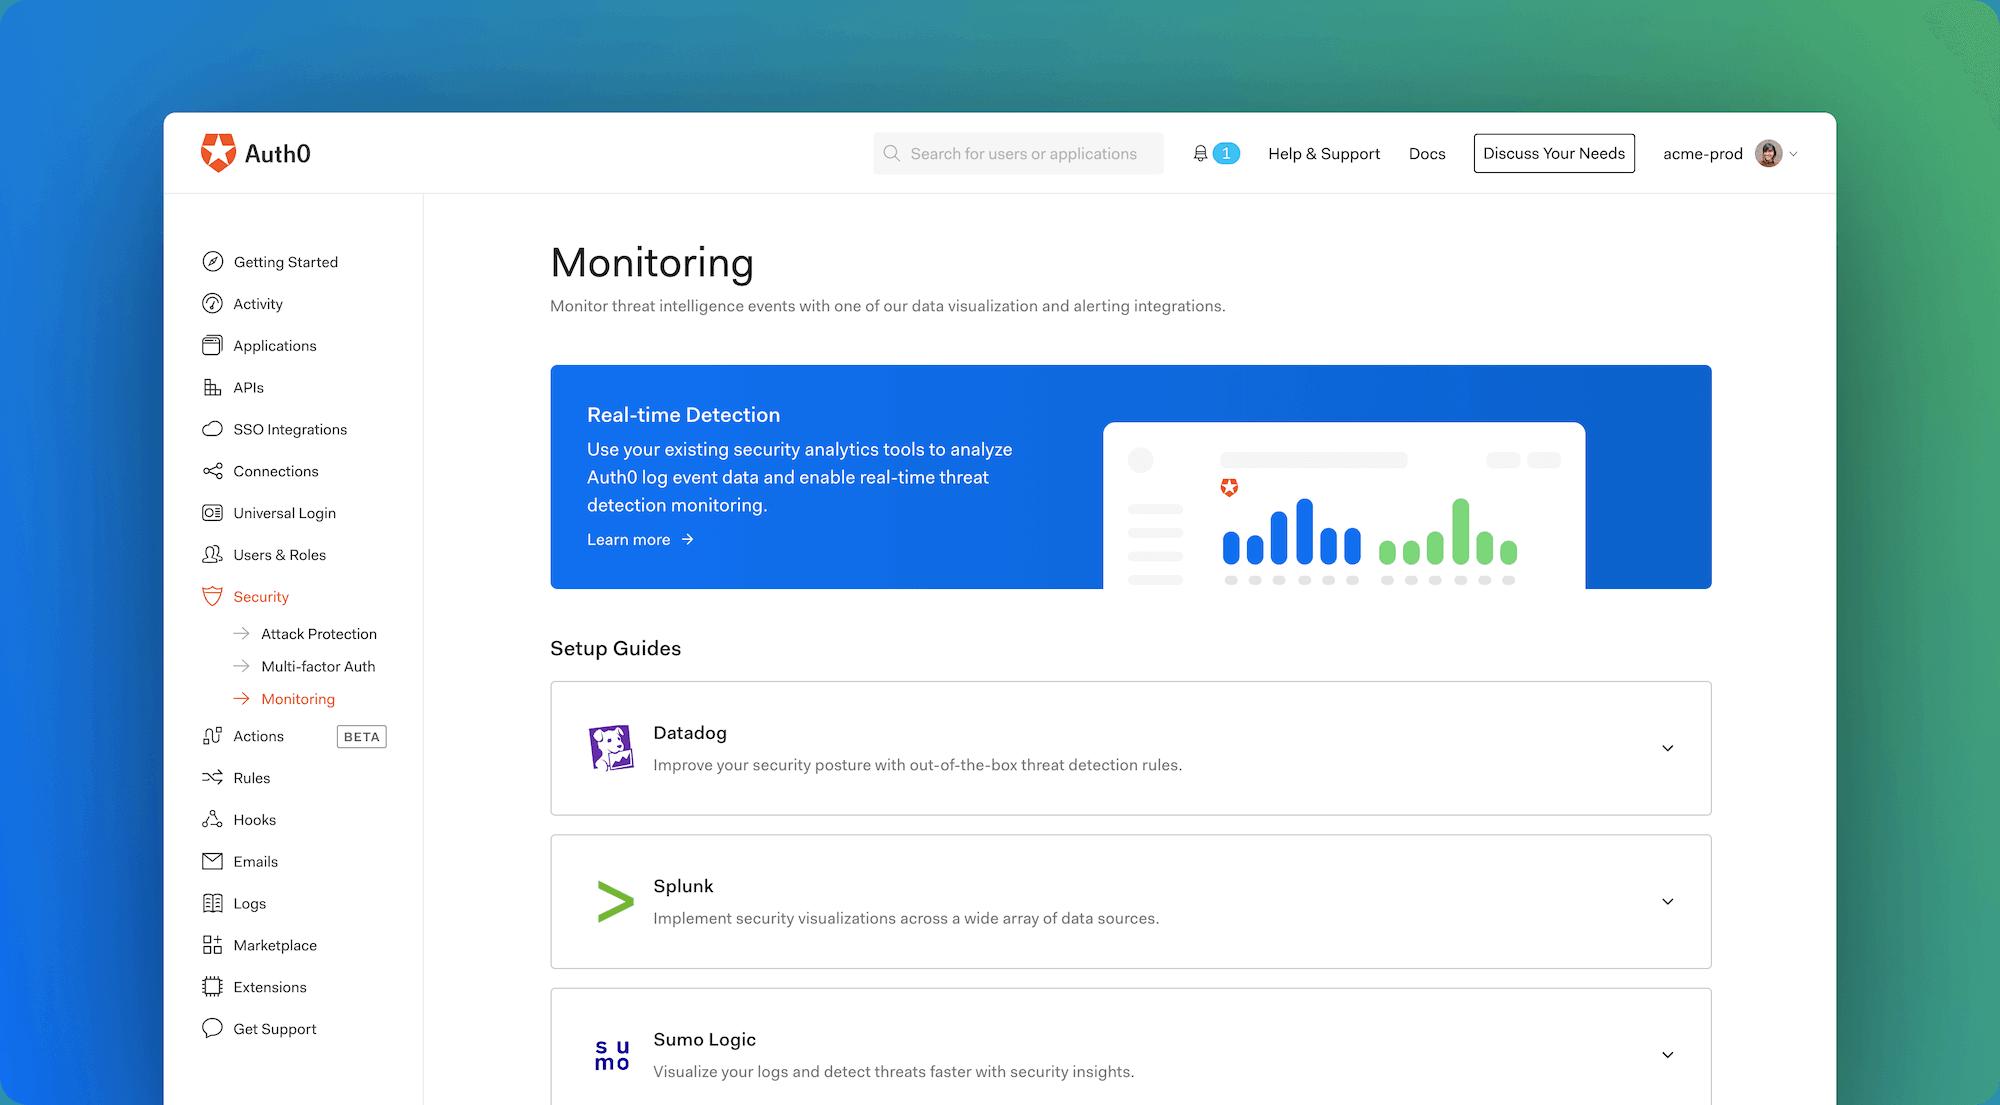 Monitoring Guides